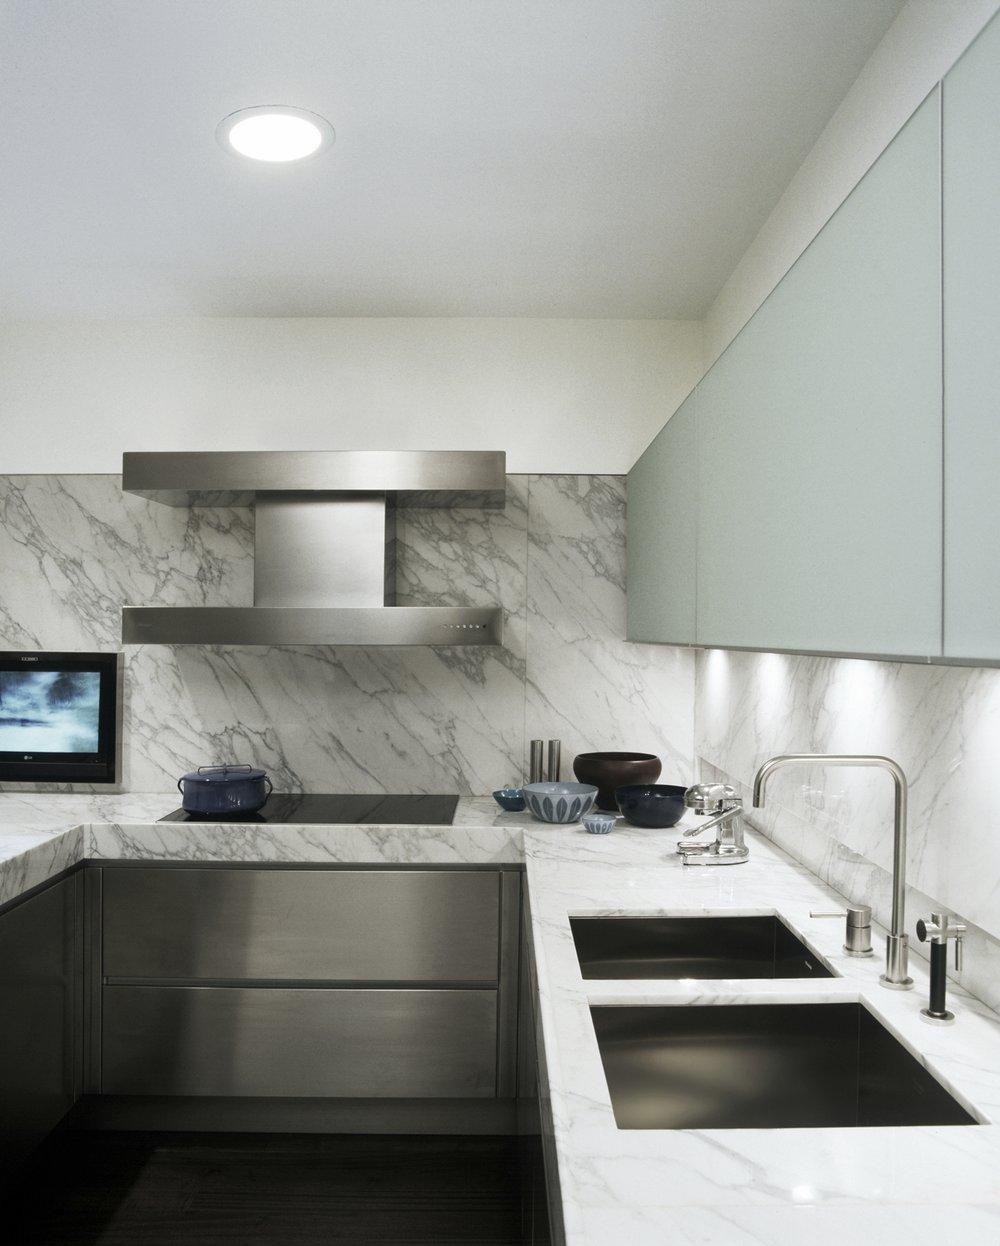 Adam Rolston, Gabriel Benroth, Drew Stuart, NYC, New York, European, apartment, kitchen, marble, cabinet, sink, faucet, stove, vent, TV, counter